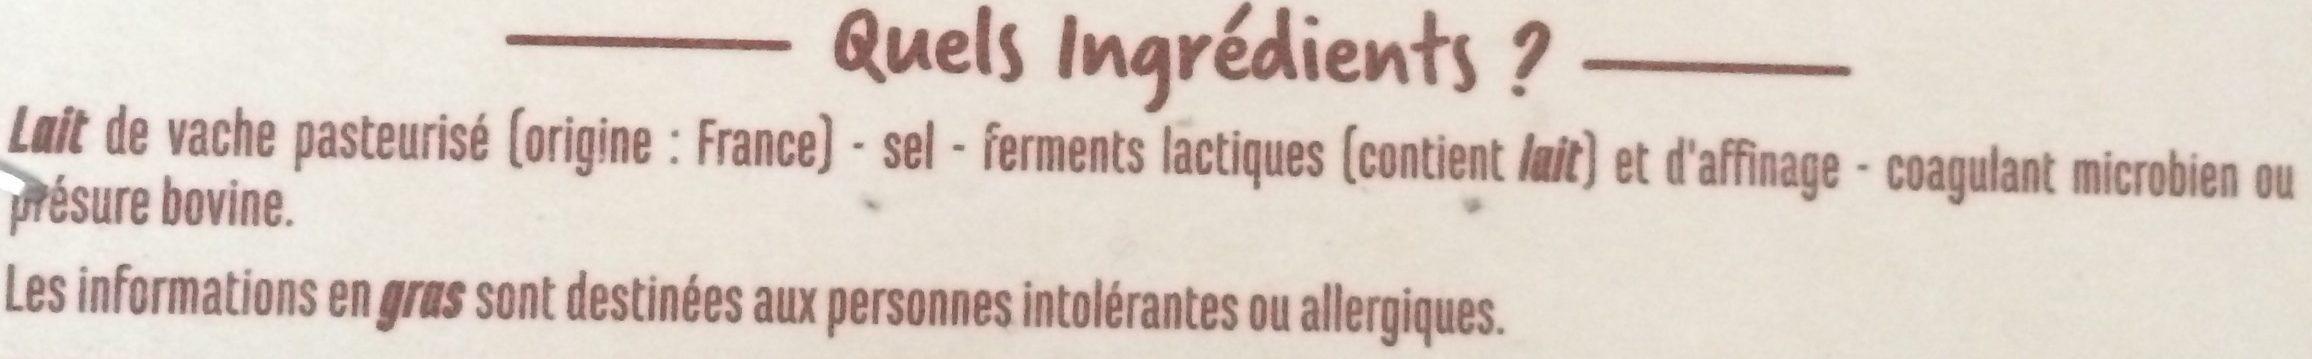 Le Rural - Camembert de caractère - Ingredients